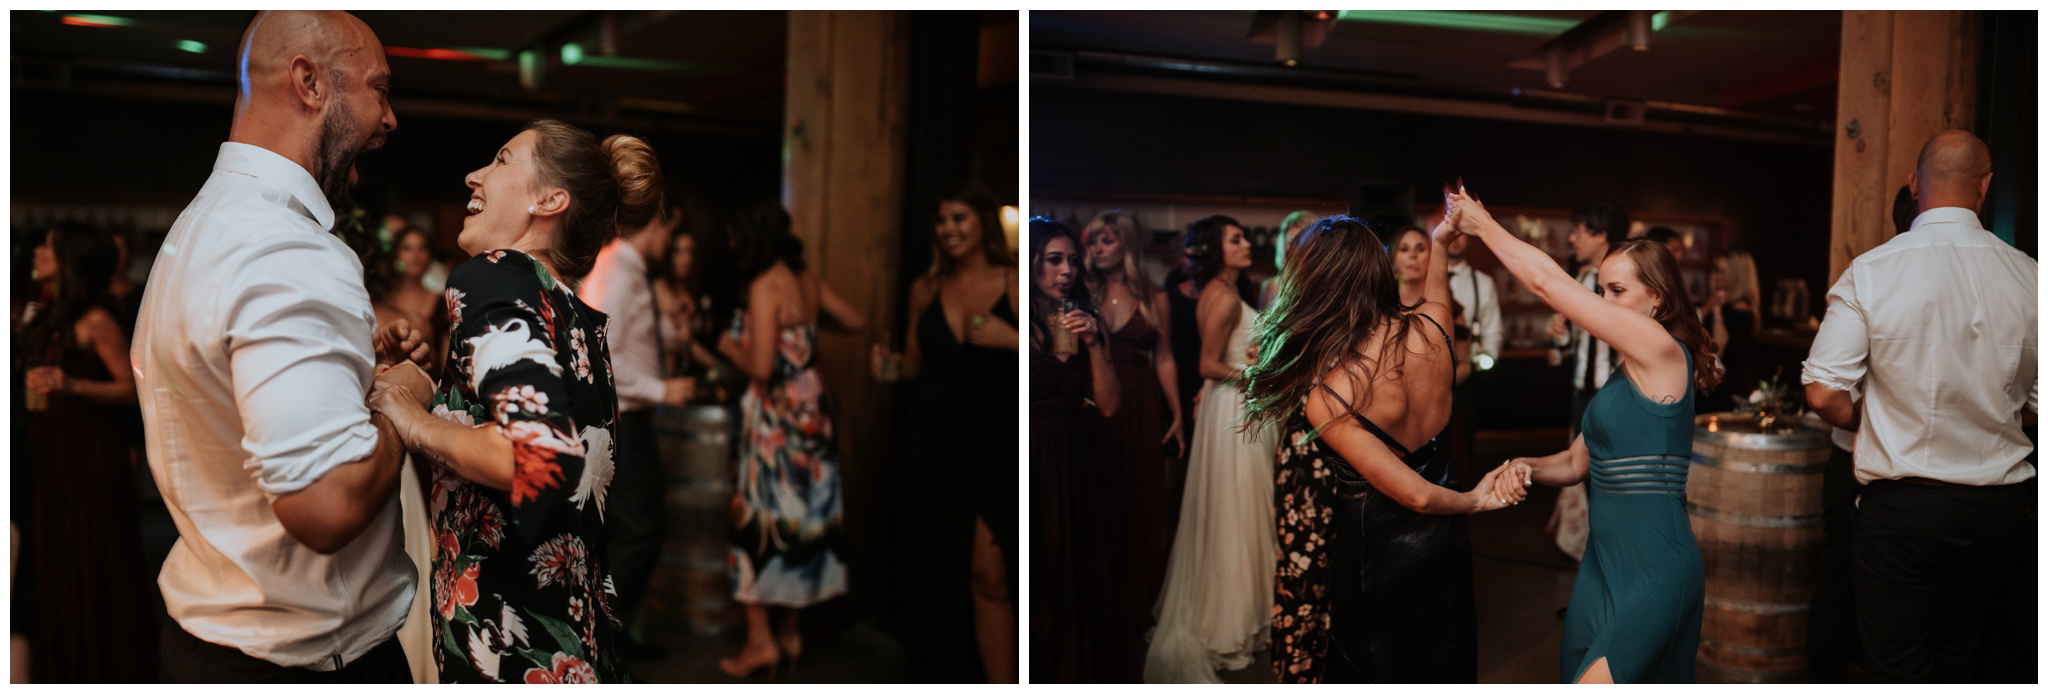 alyssa-keiran-westland-distillery-urban-seattle-wedding-photographer-caitlyn-nikula-163.jpg